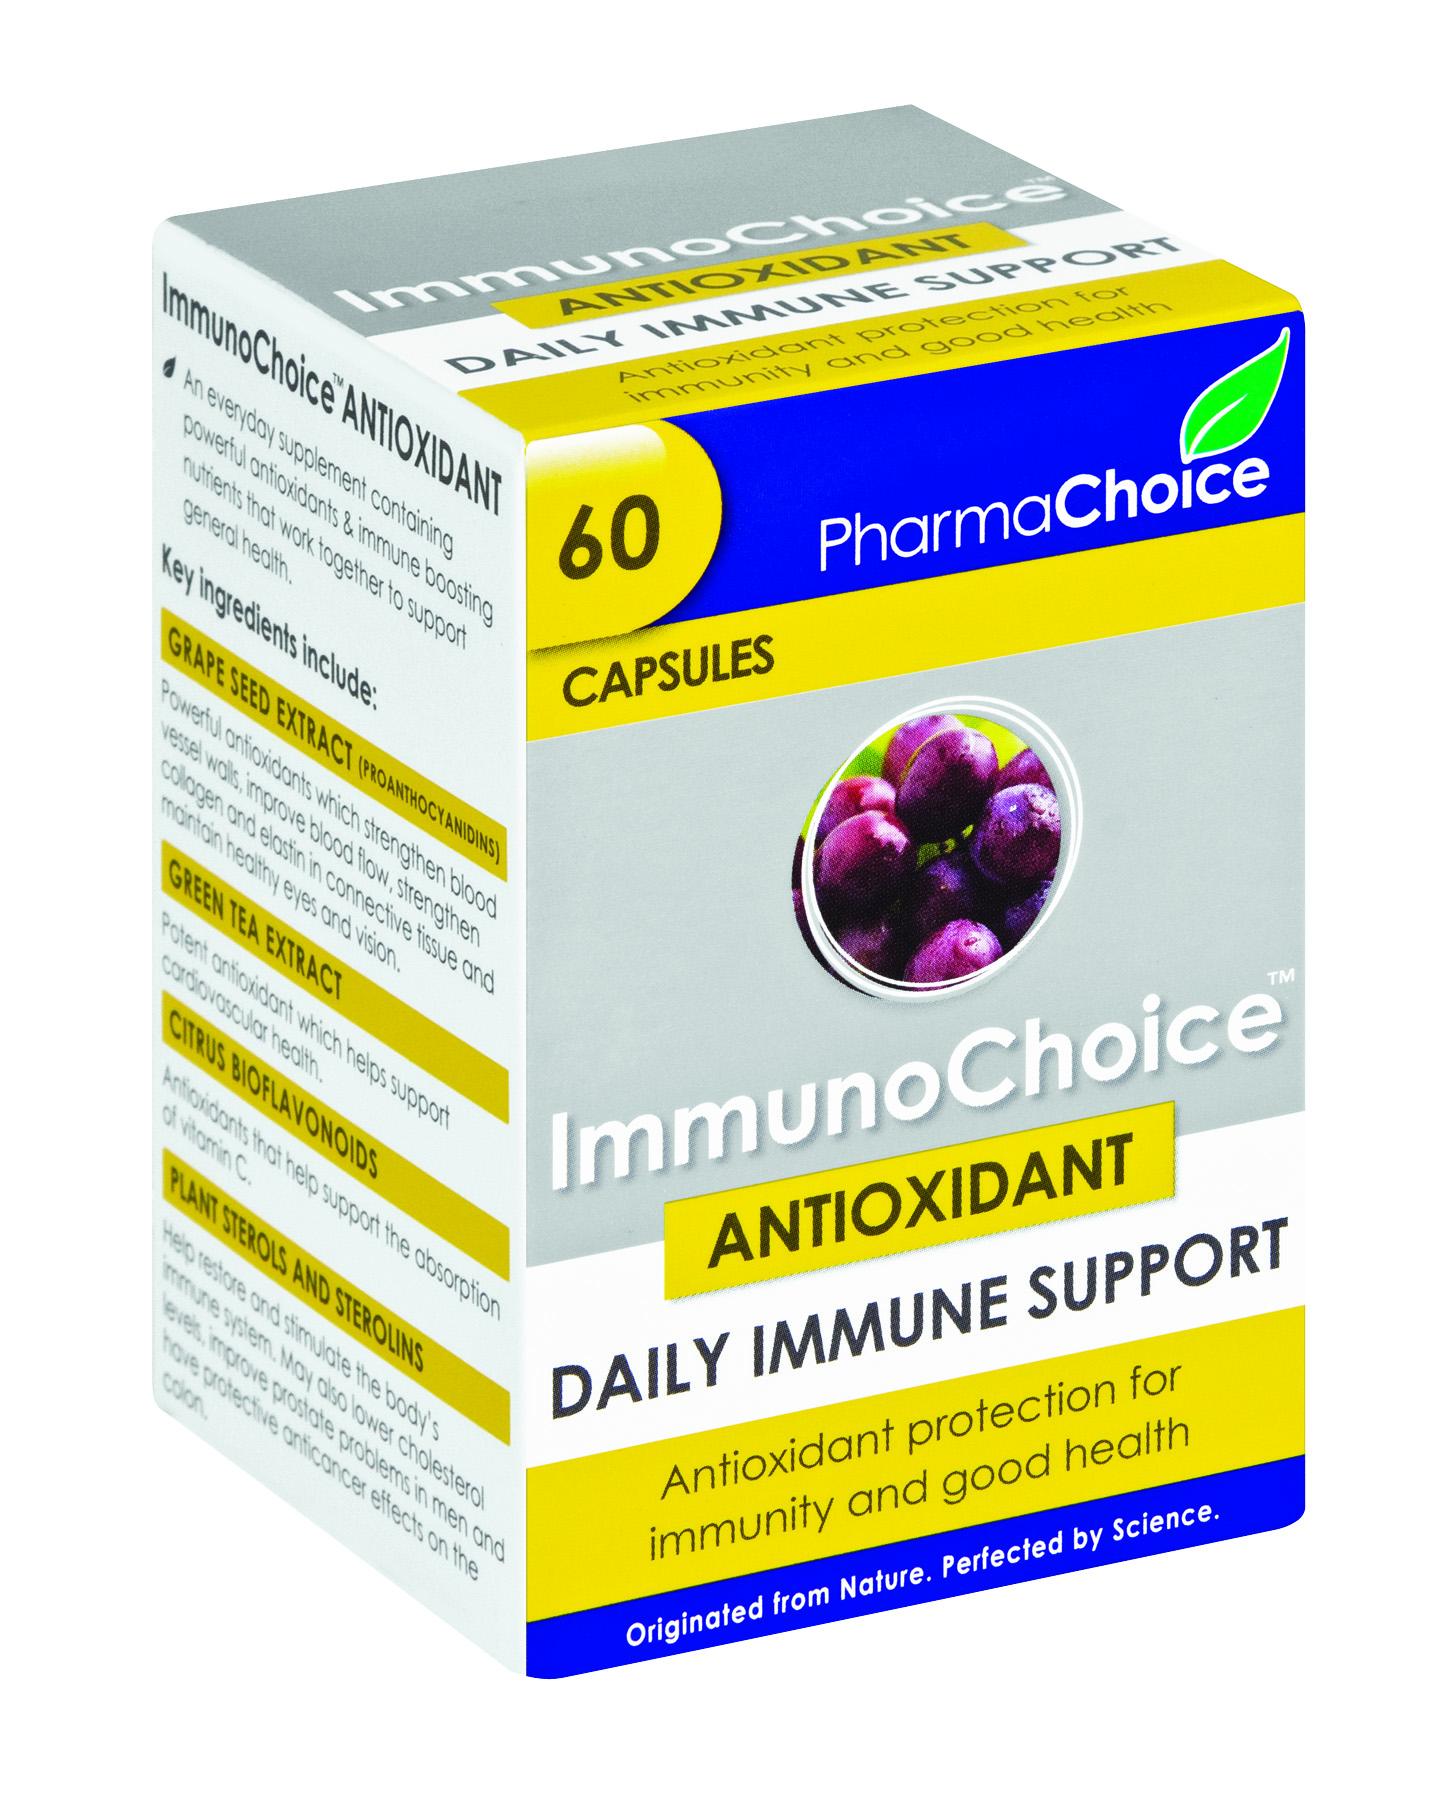 buy Immuno Choice Antioxidant online